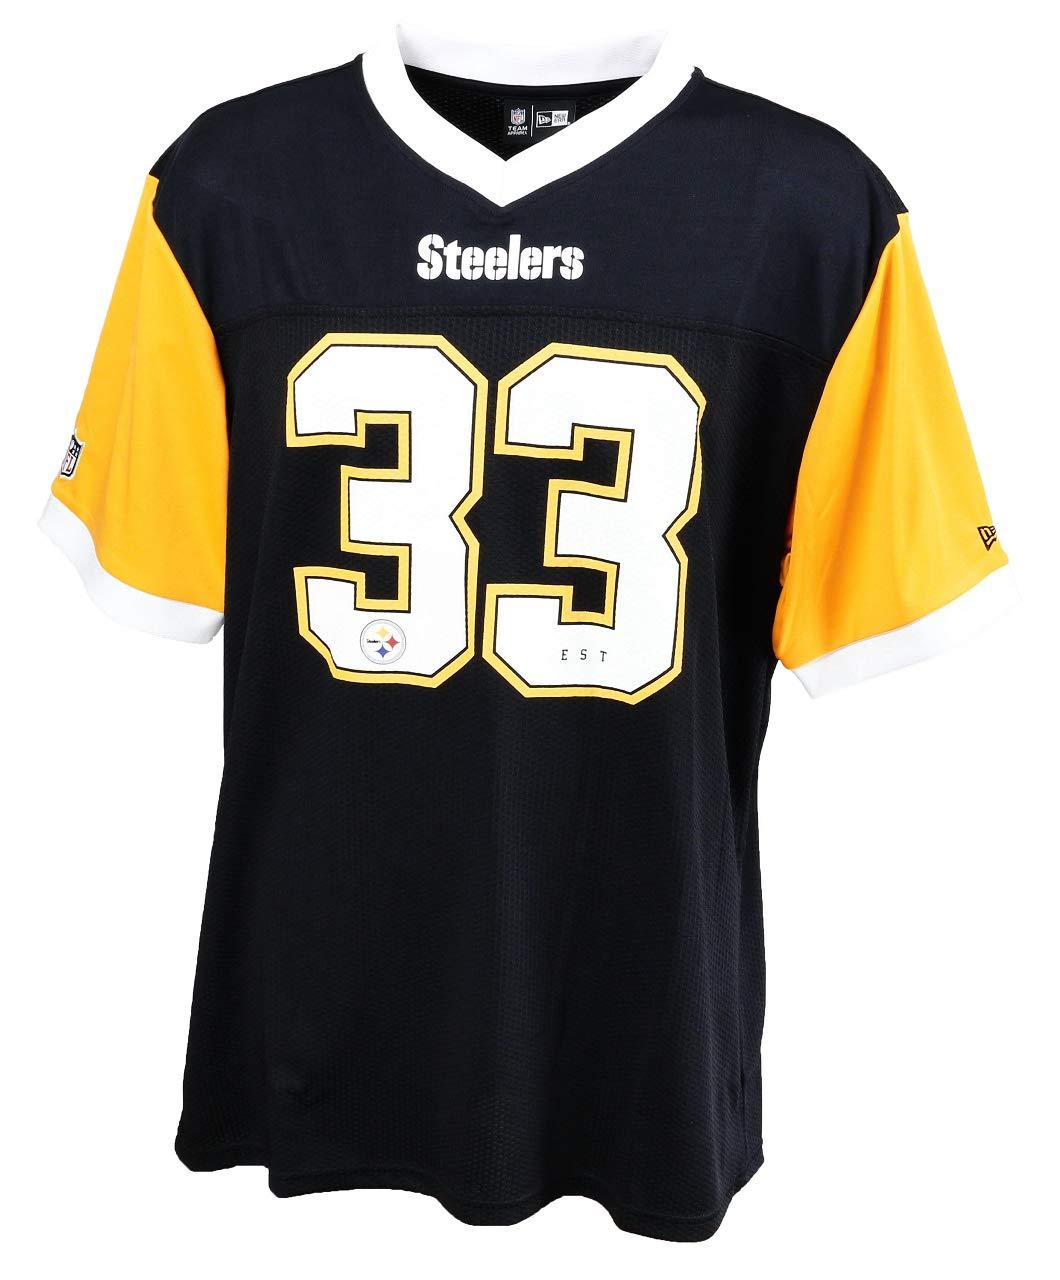 detailed look 398ac 18dab New Era NFL Jersey Trikot Shirt - Pittsburgh Steelers